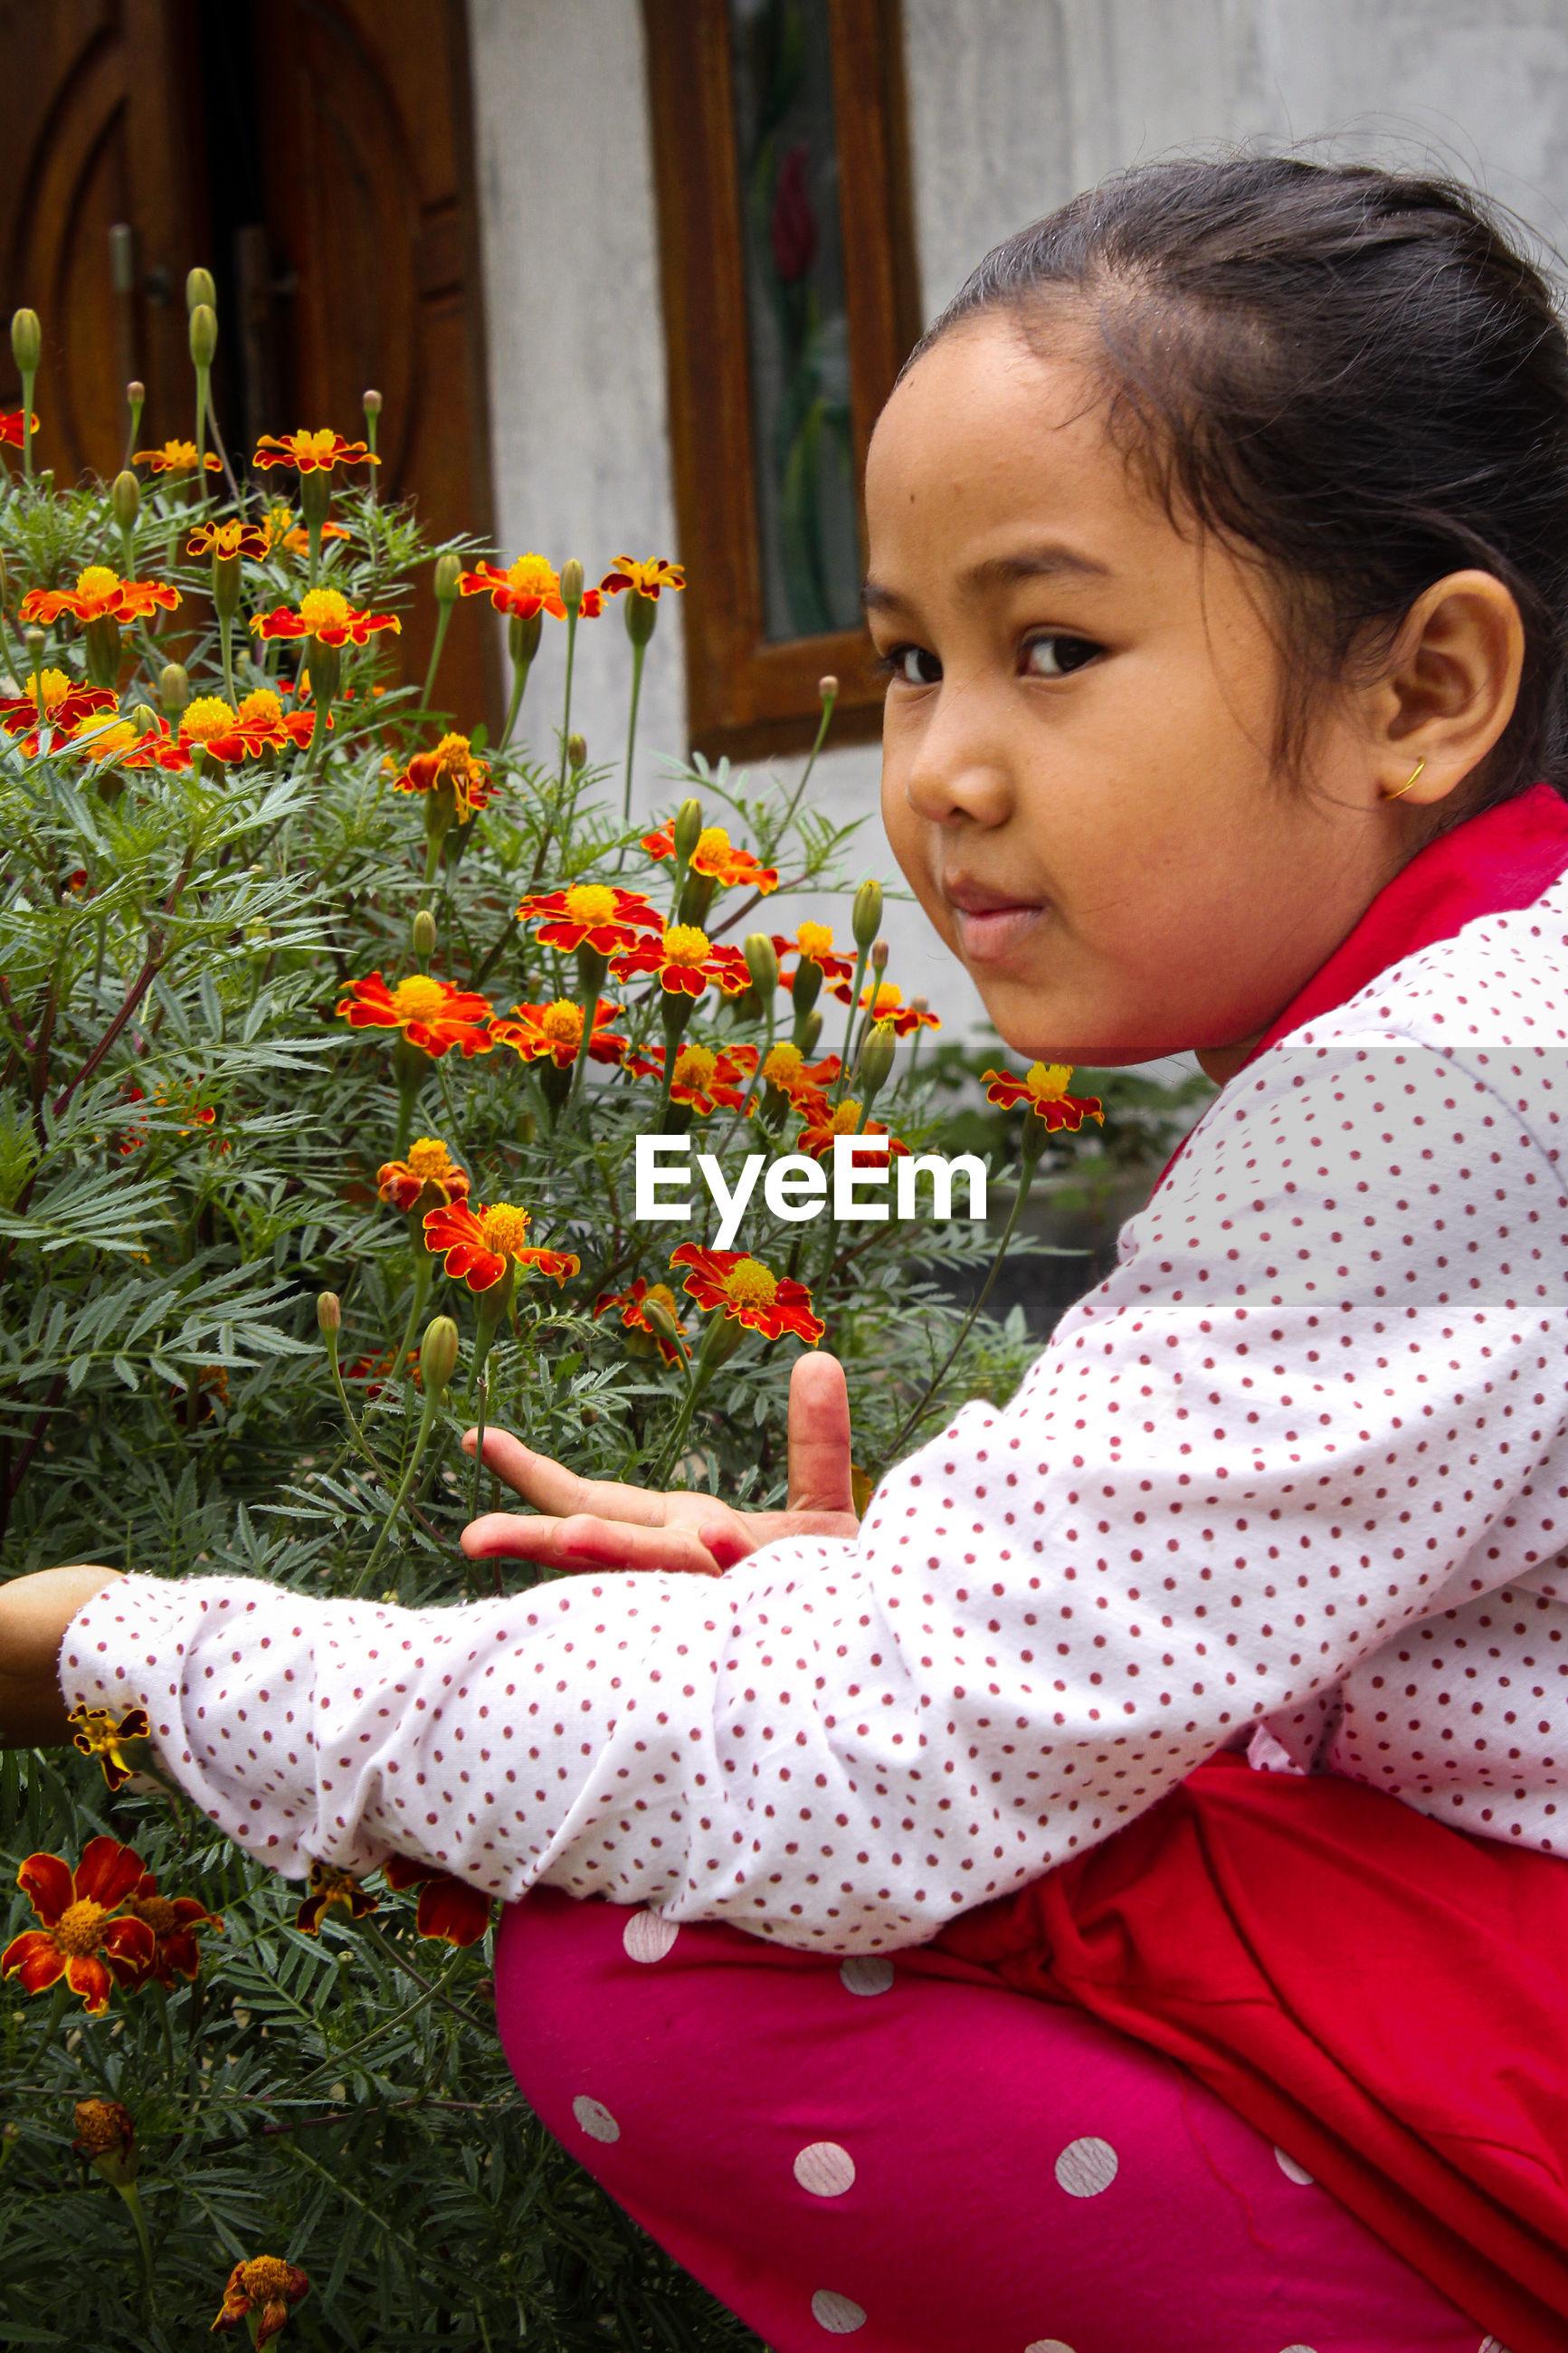 Side view of cute girl looking at red flowering plants